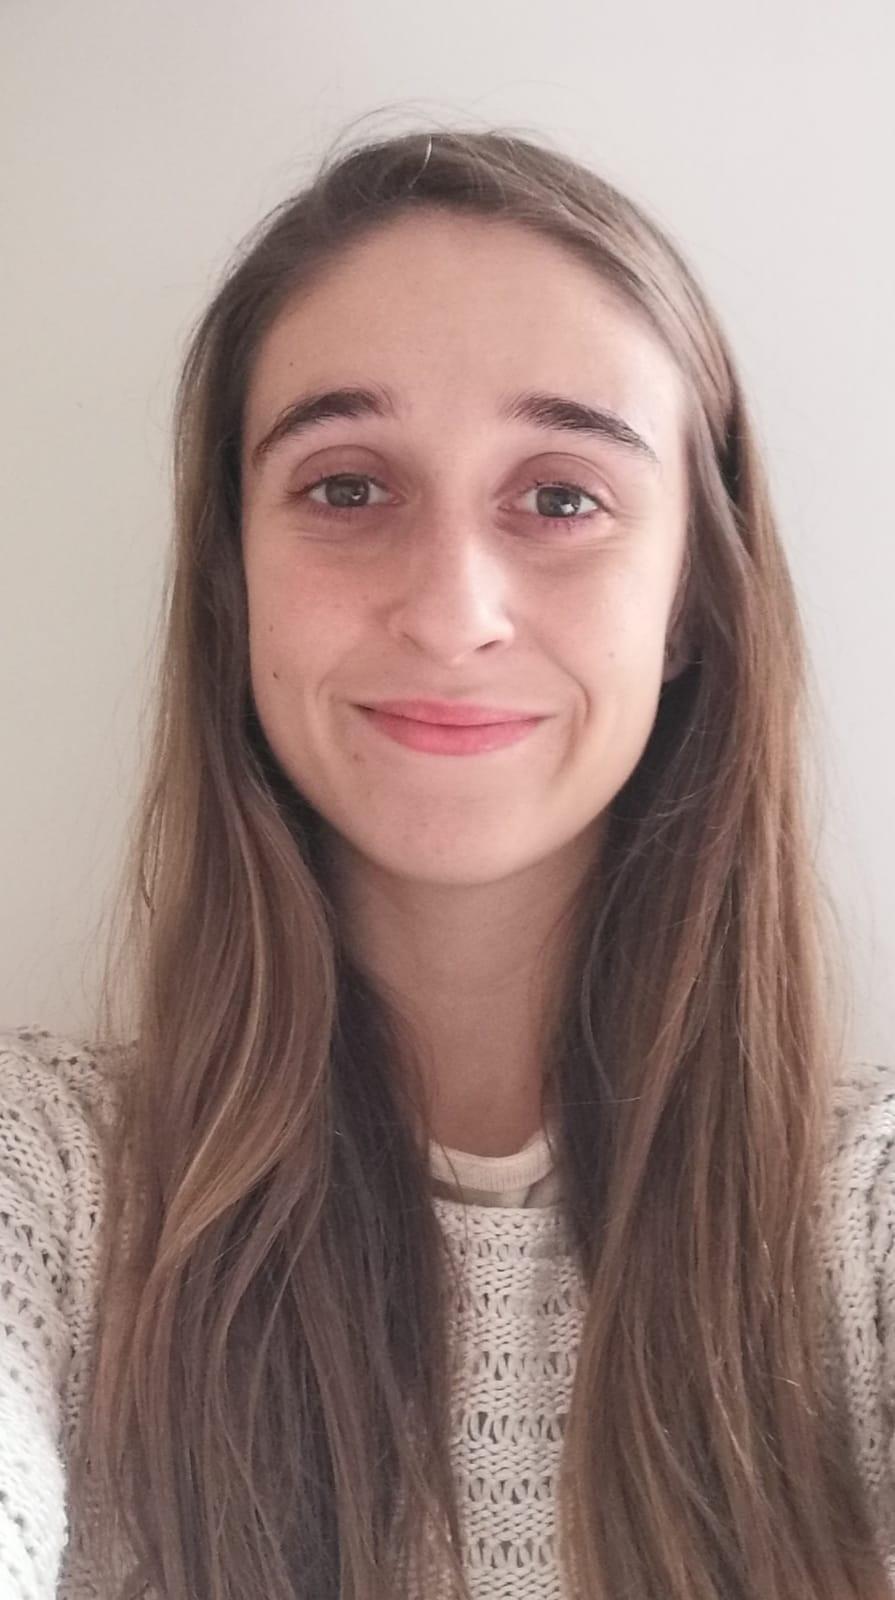 Ana Candela Celdran